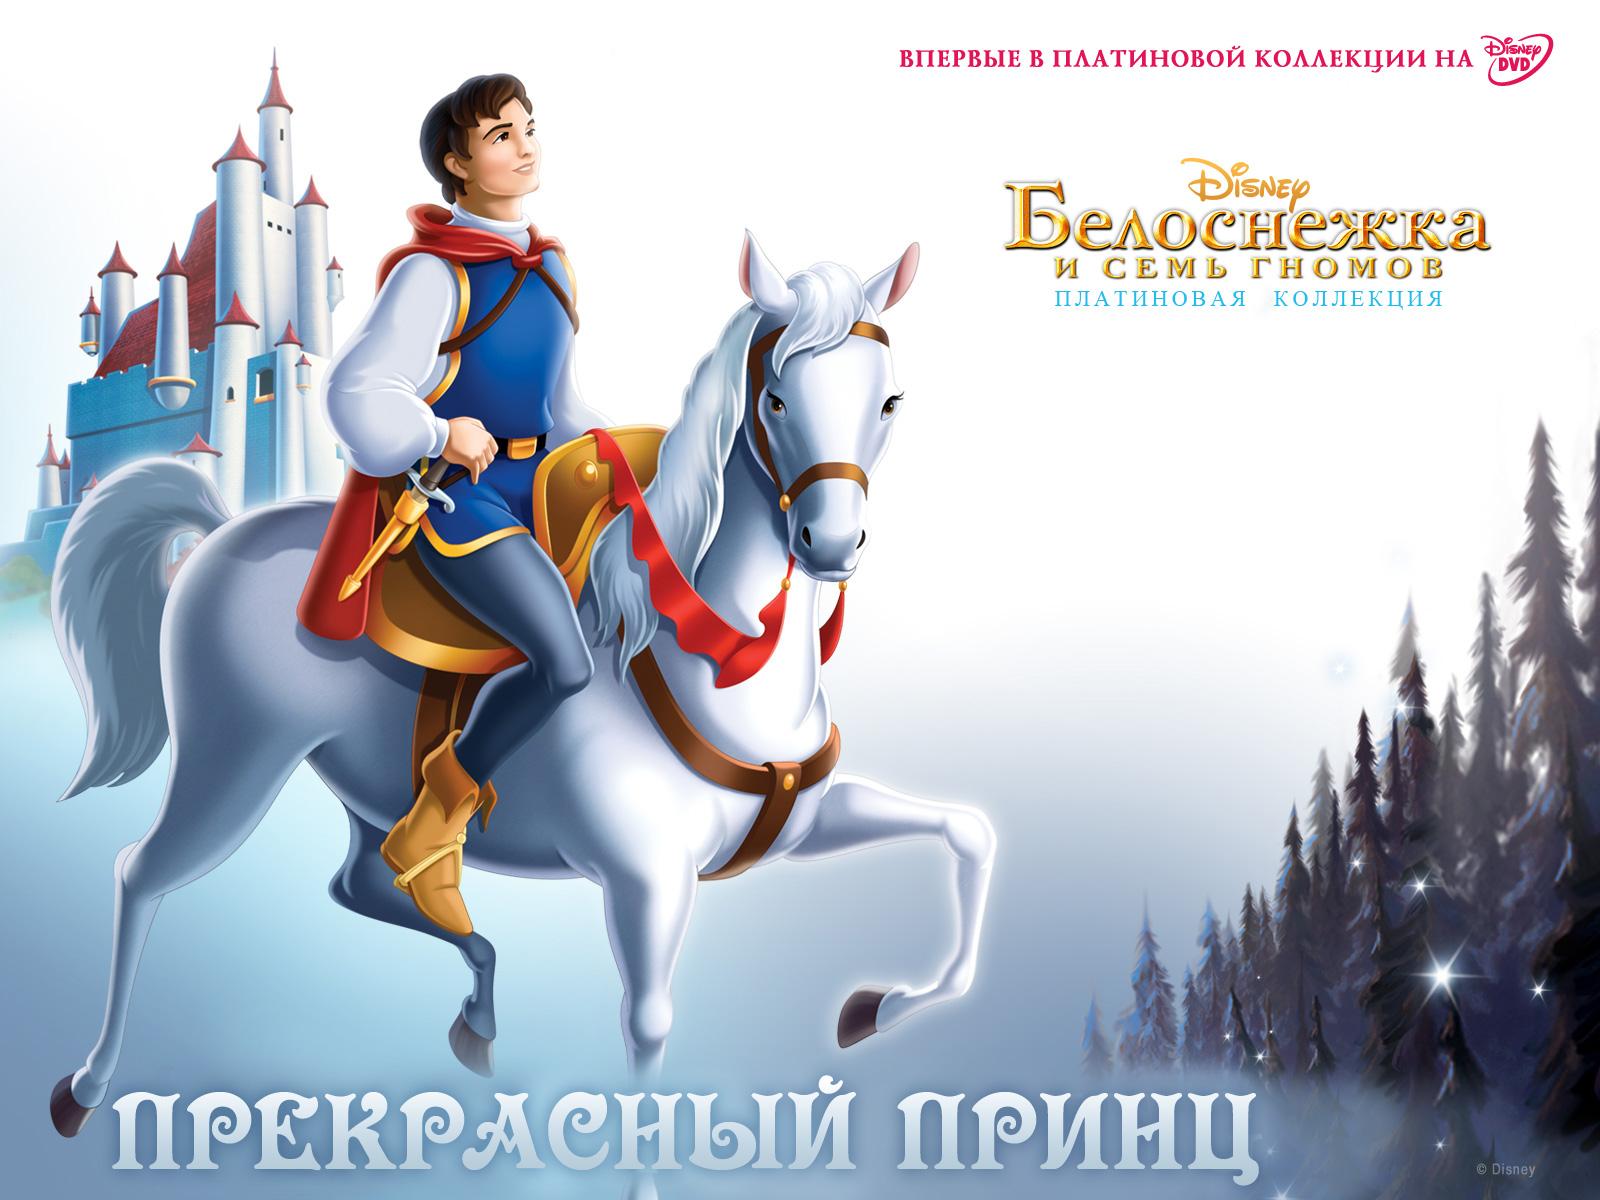 Кино, Snow White and the Seven Dwarfs, фильм, Белоснежка и семь гномов